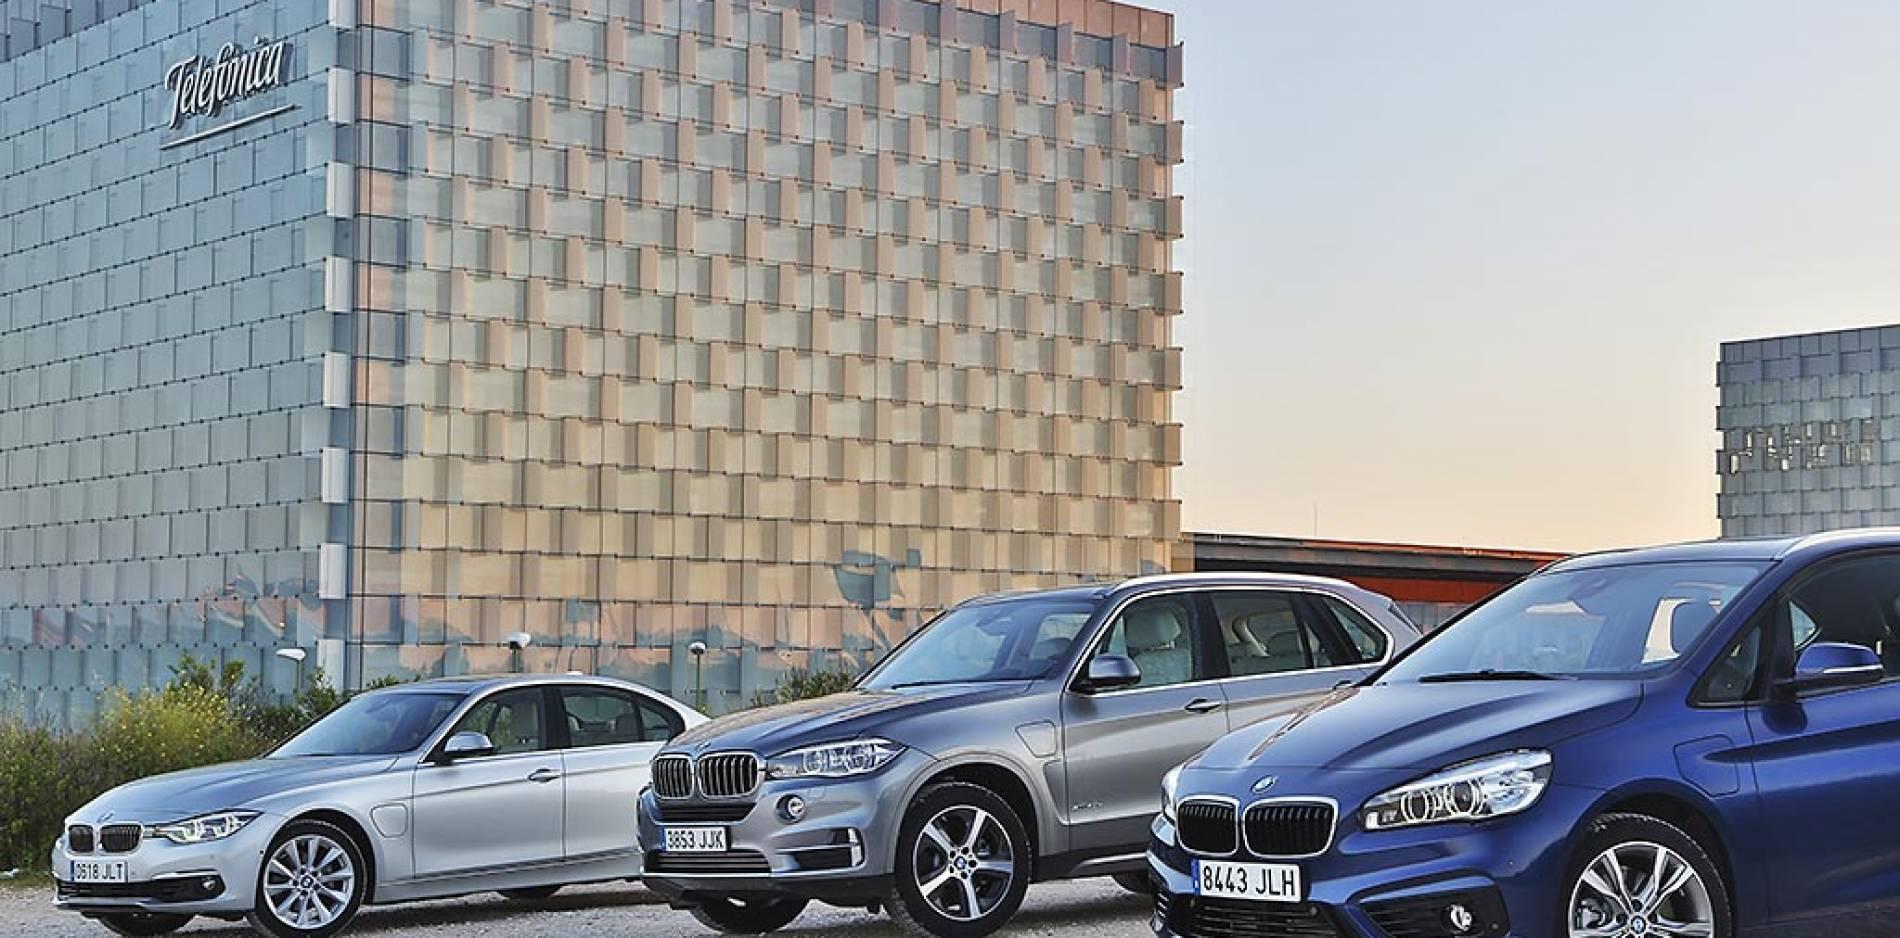 Gama BMW iPerformance: probamos los híbridos enchufables de BMW